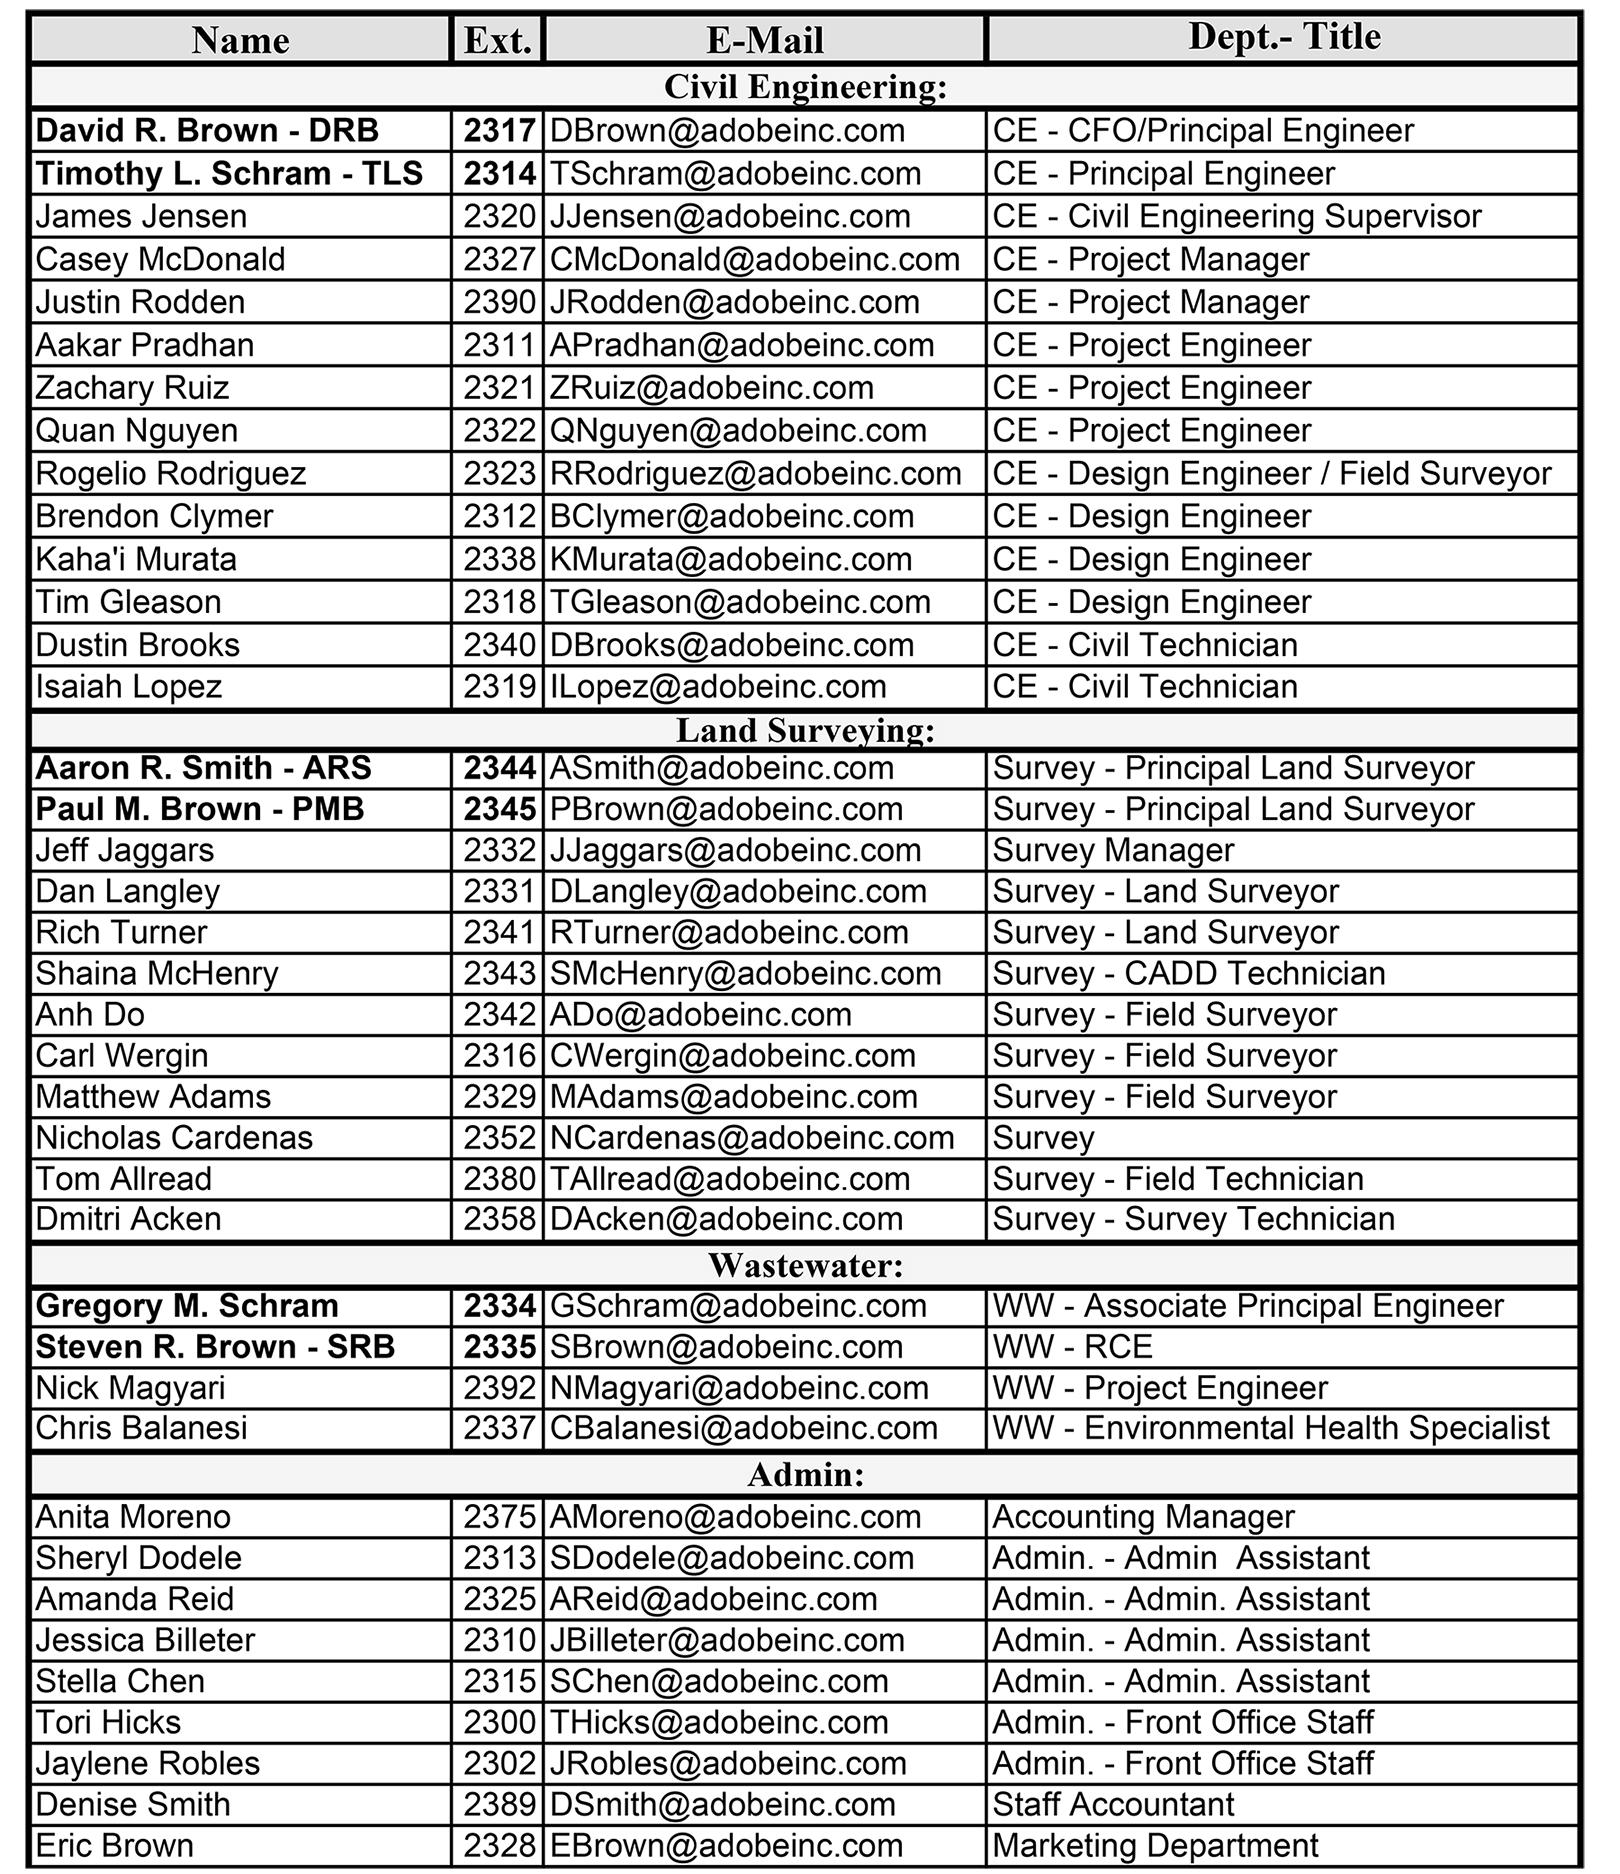 Image of Staff List - Call 707-541-2300 to reach staff.